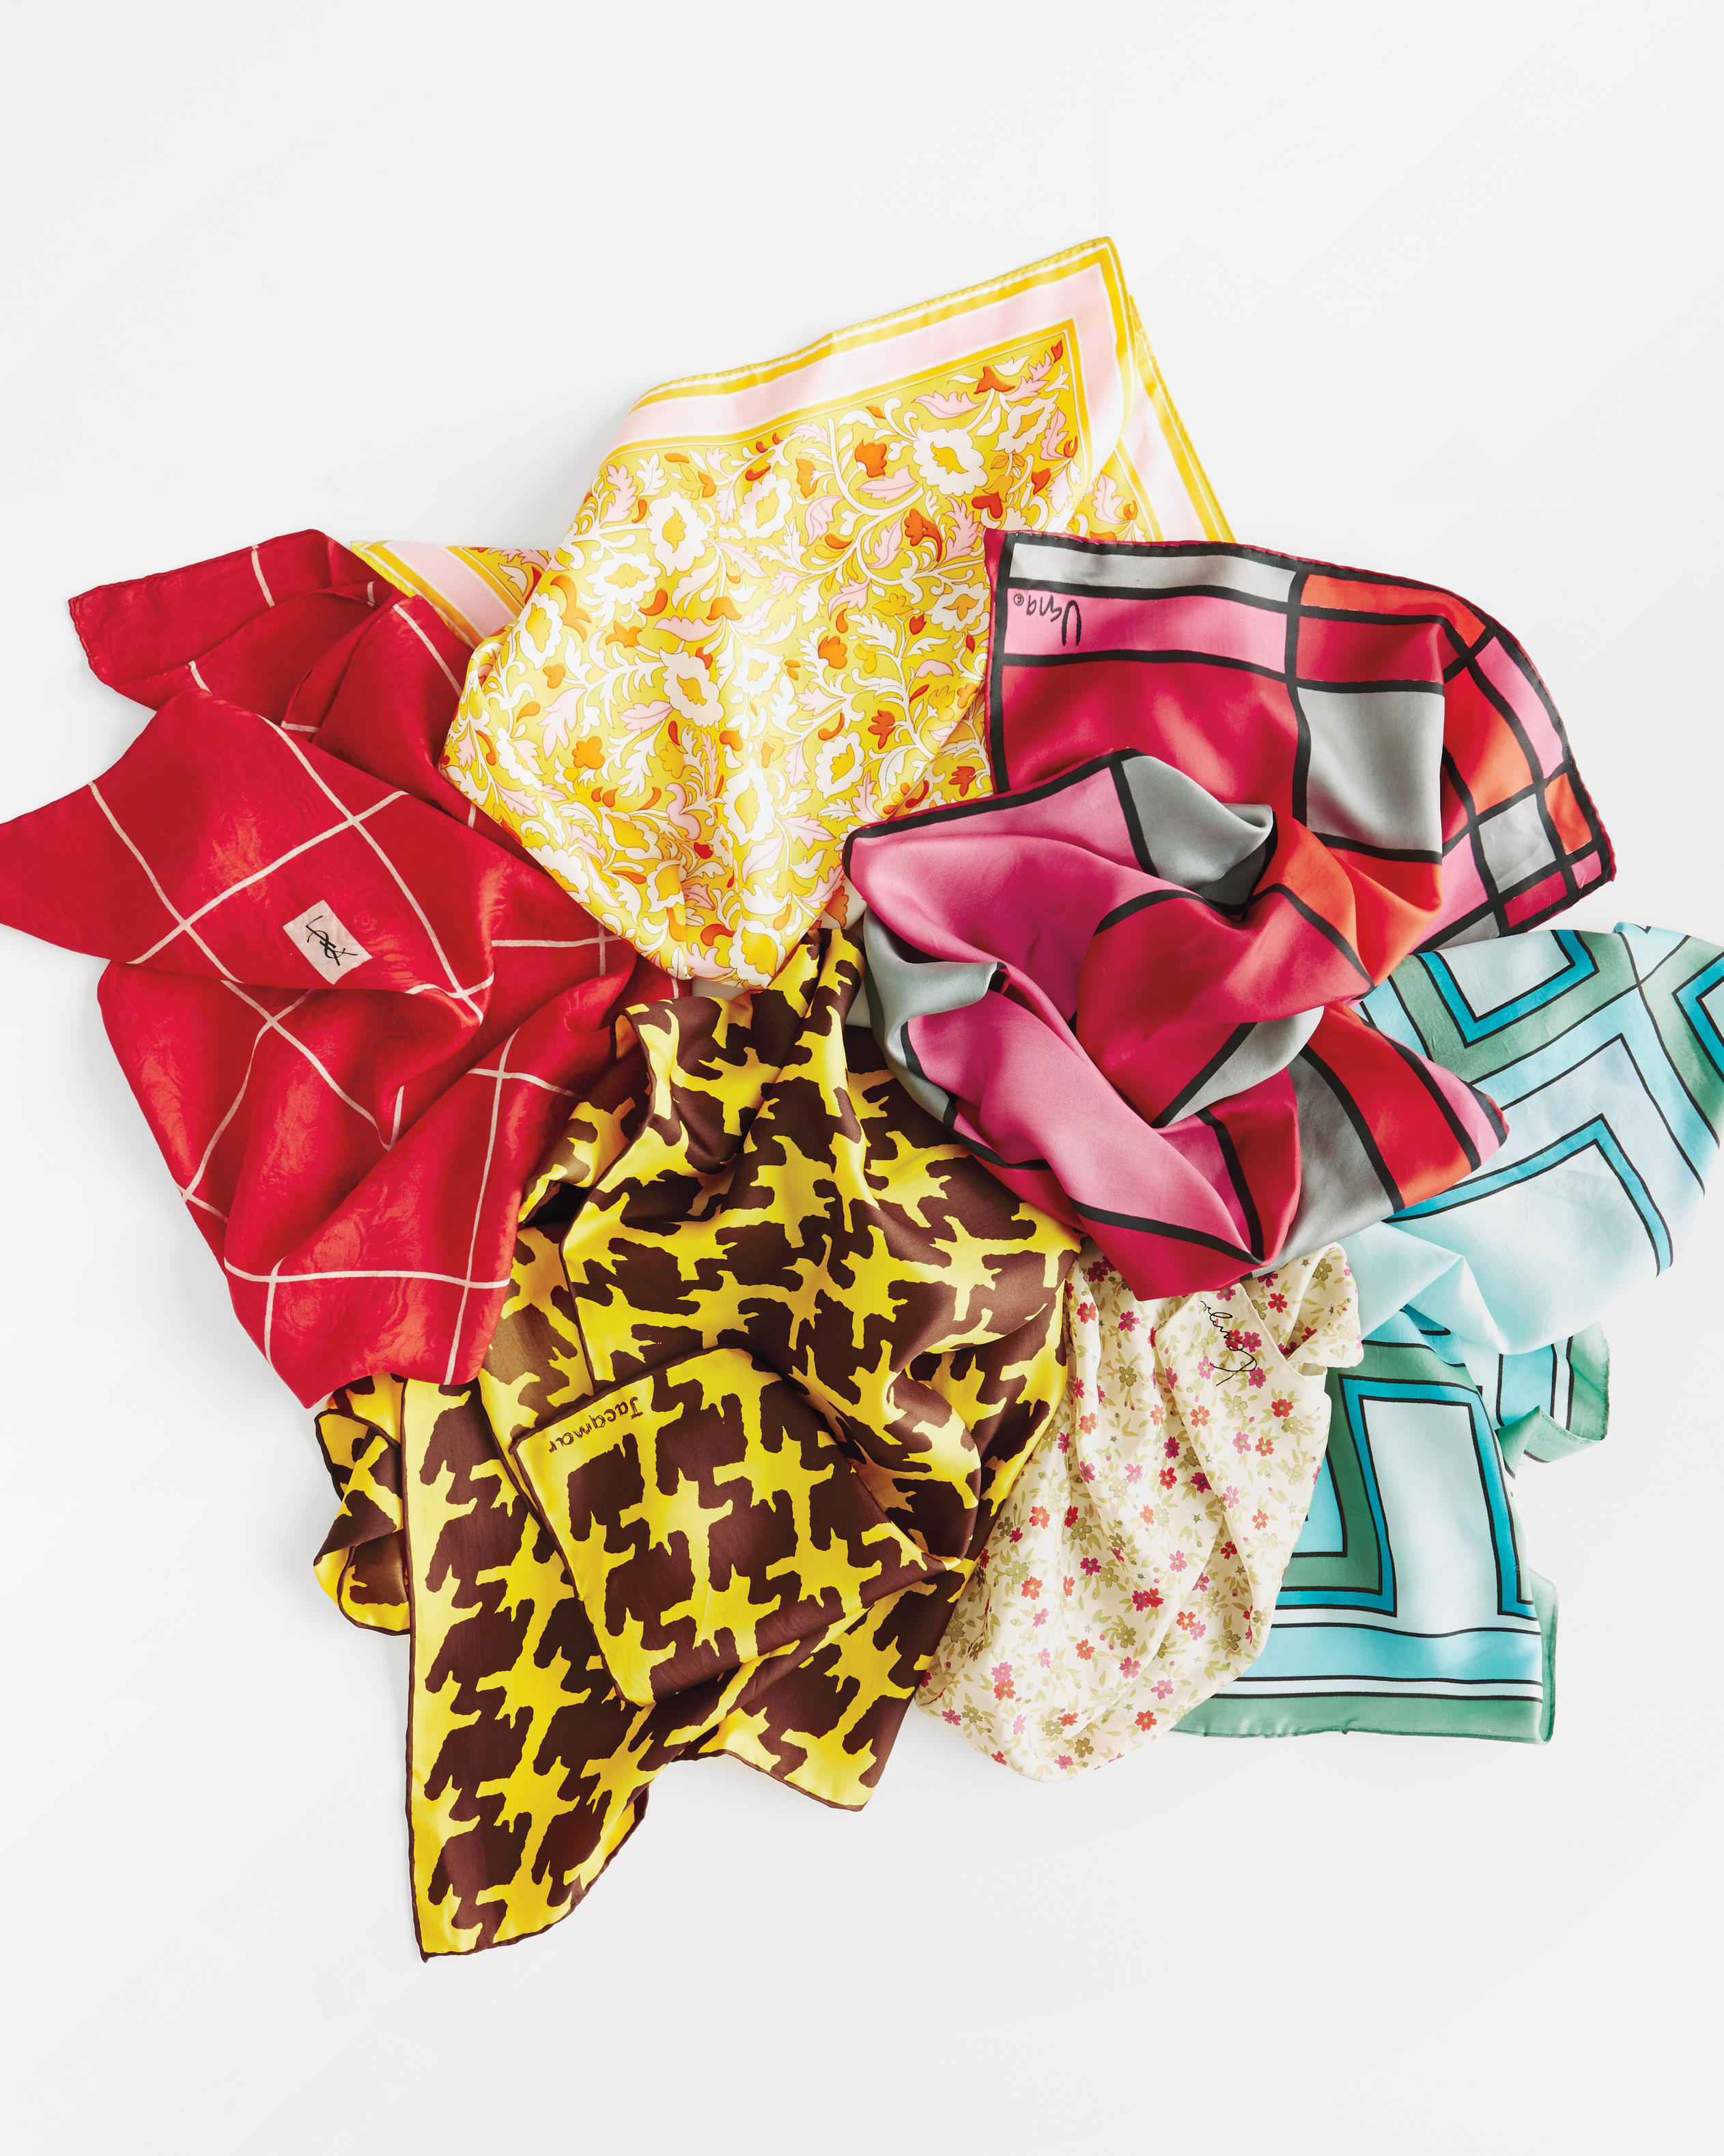 scarf-pile-187-d111649.jpg